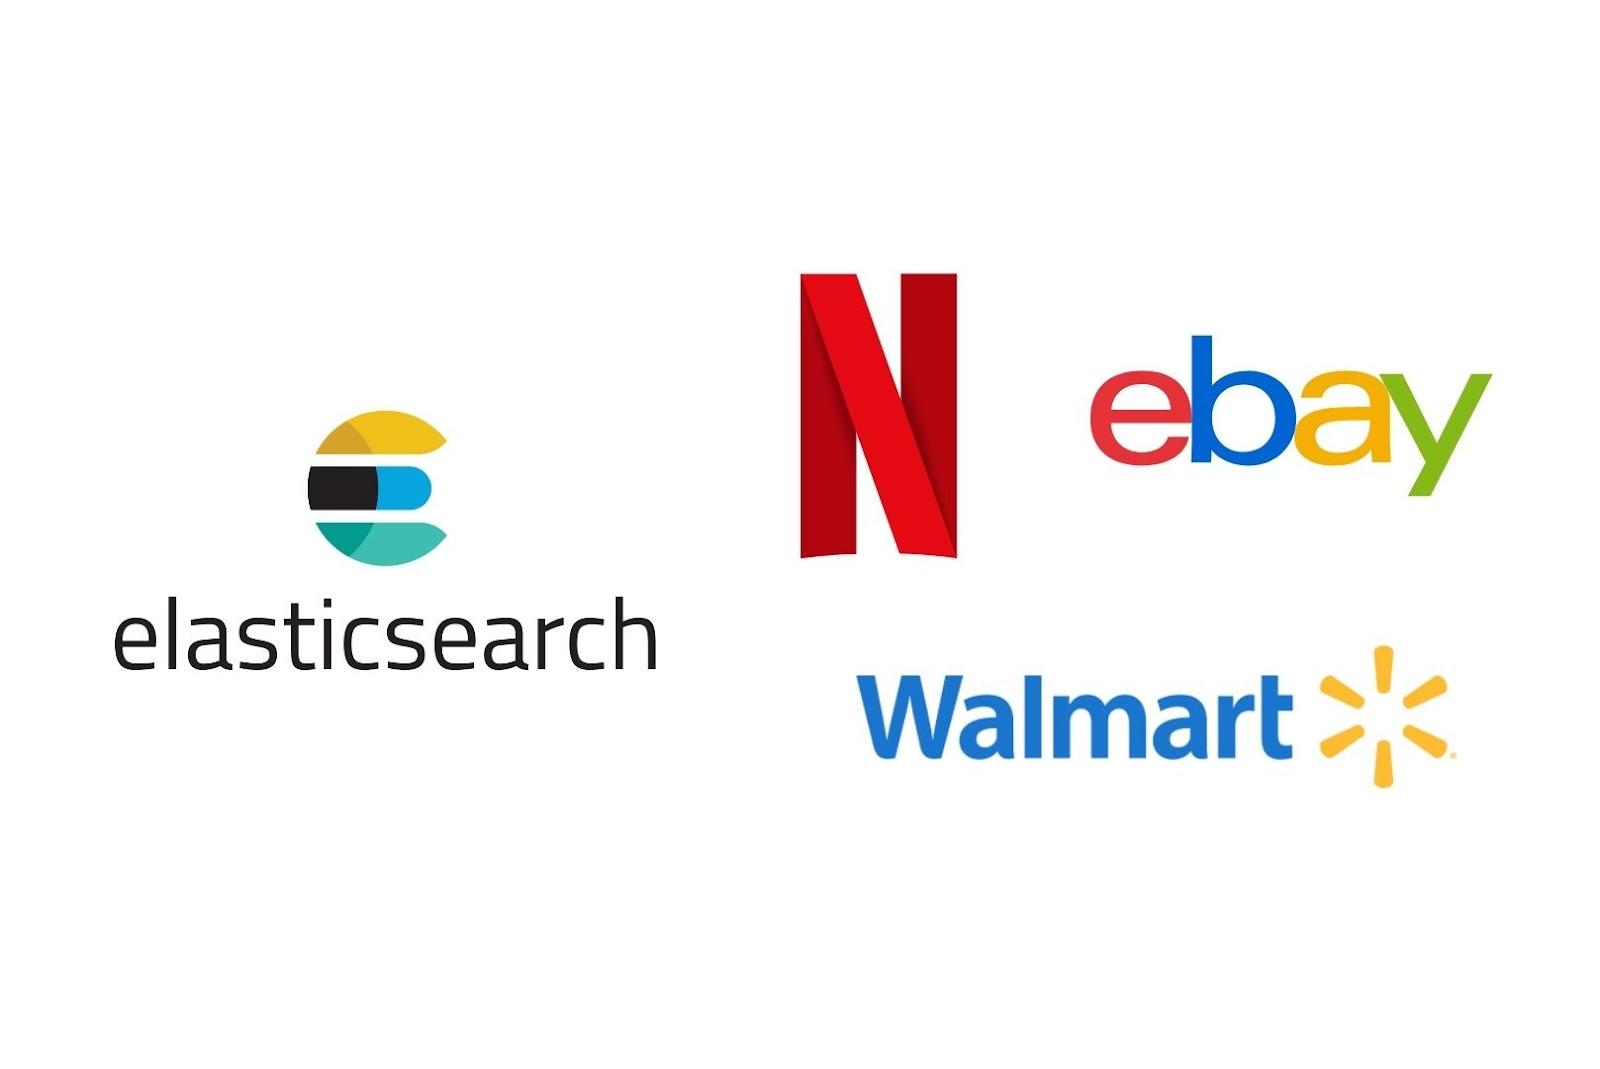 Big companies using elasticsearch